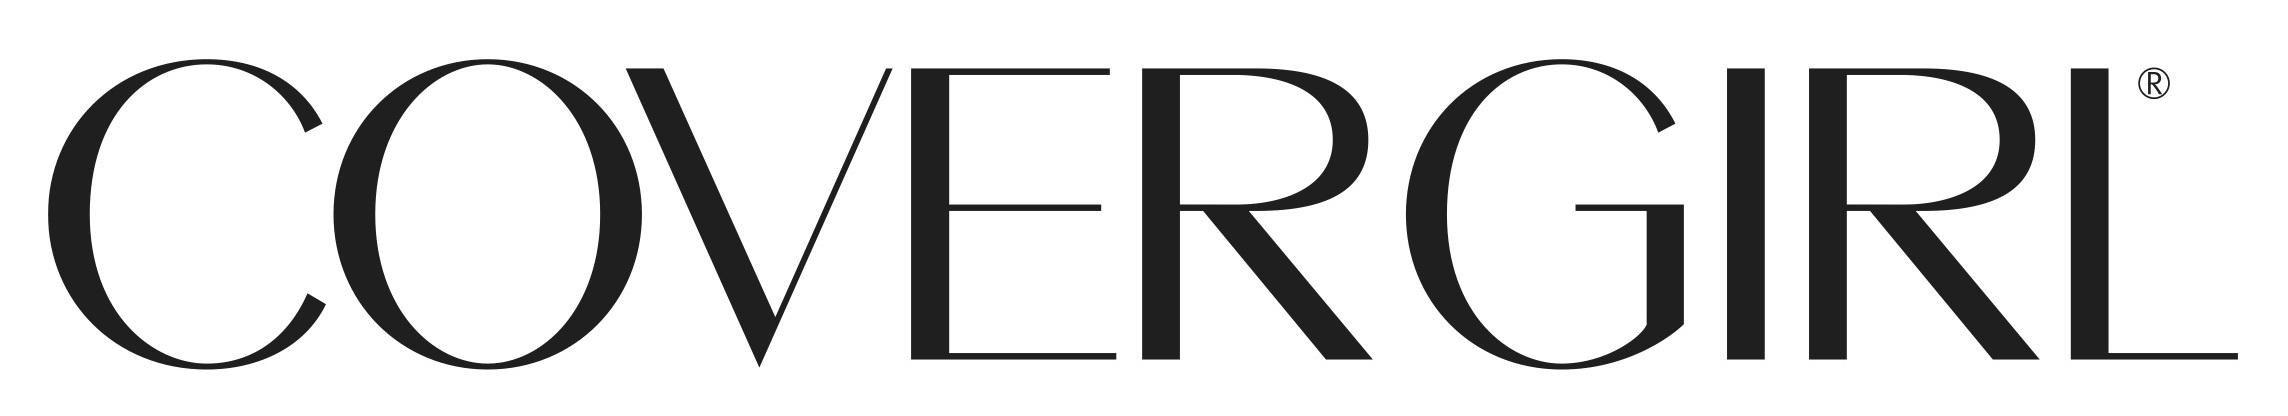 COVERGIRL Logo, via Creative Commons